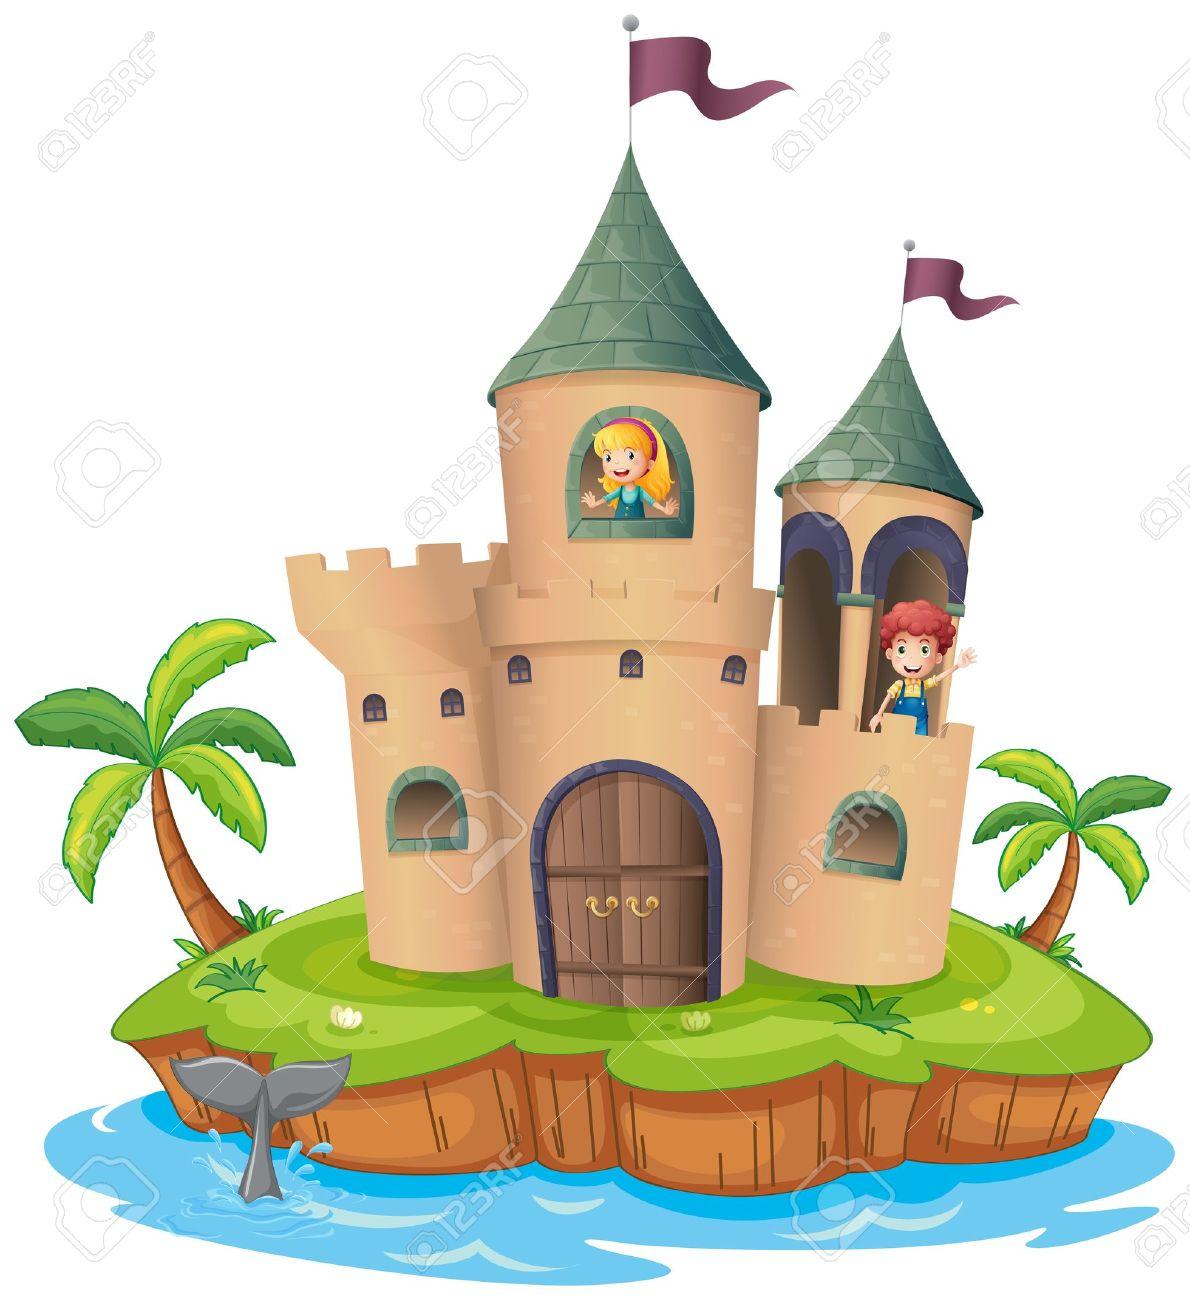 Clip Art Castle Images & Stock Pictures. Royalty Free Clip Art.